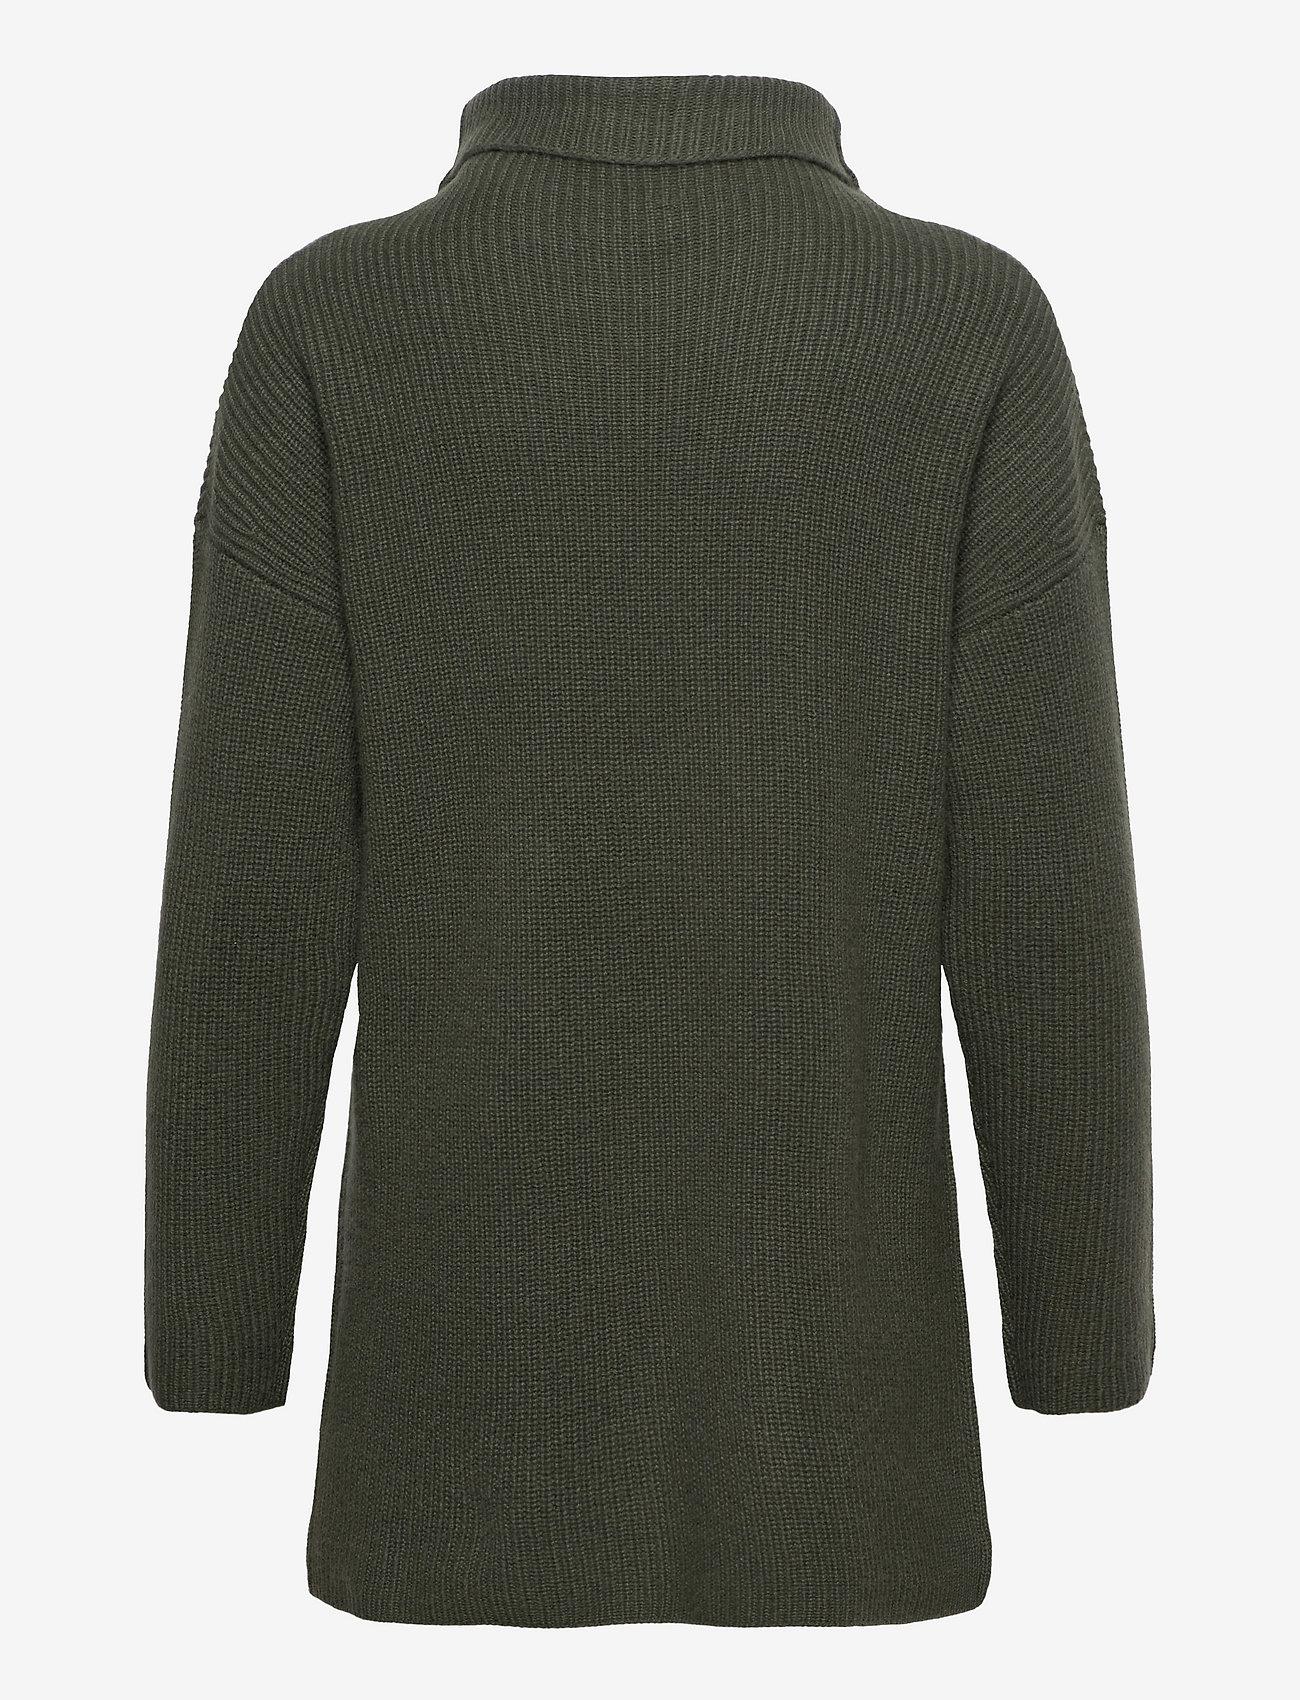 Davida Cashmere - Oversized Rib Sweater - turtlenecks - army green - 1